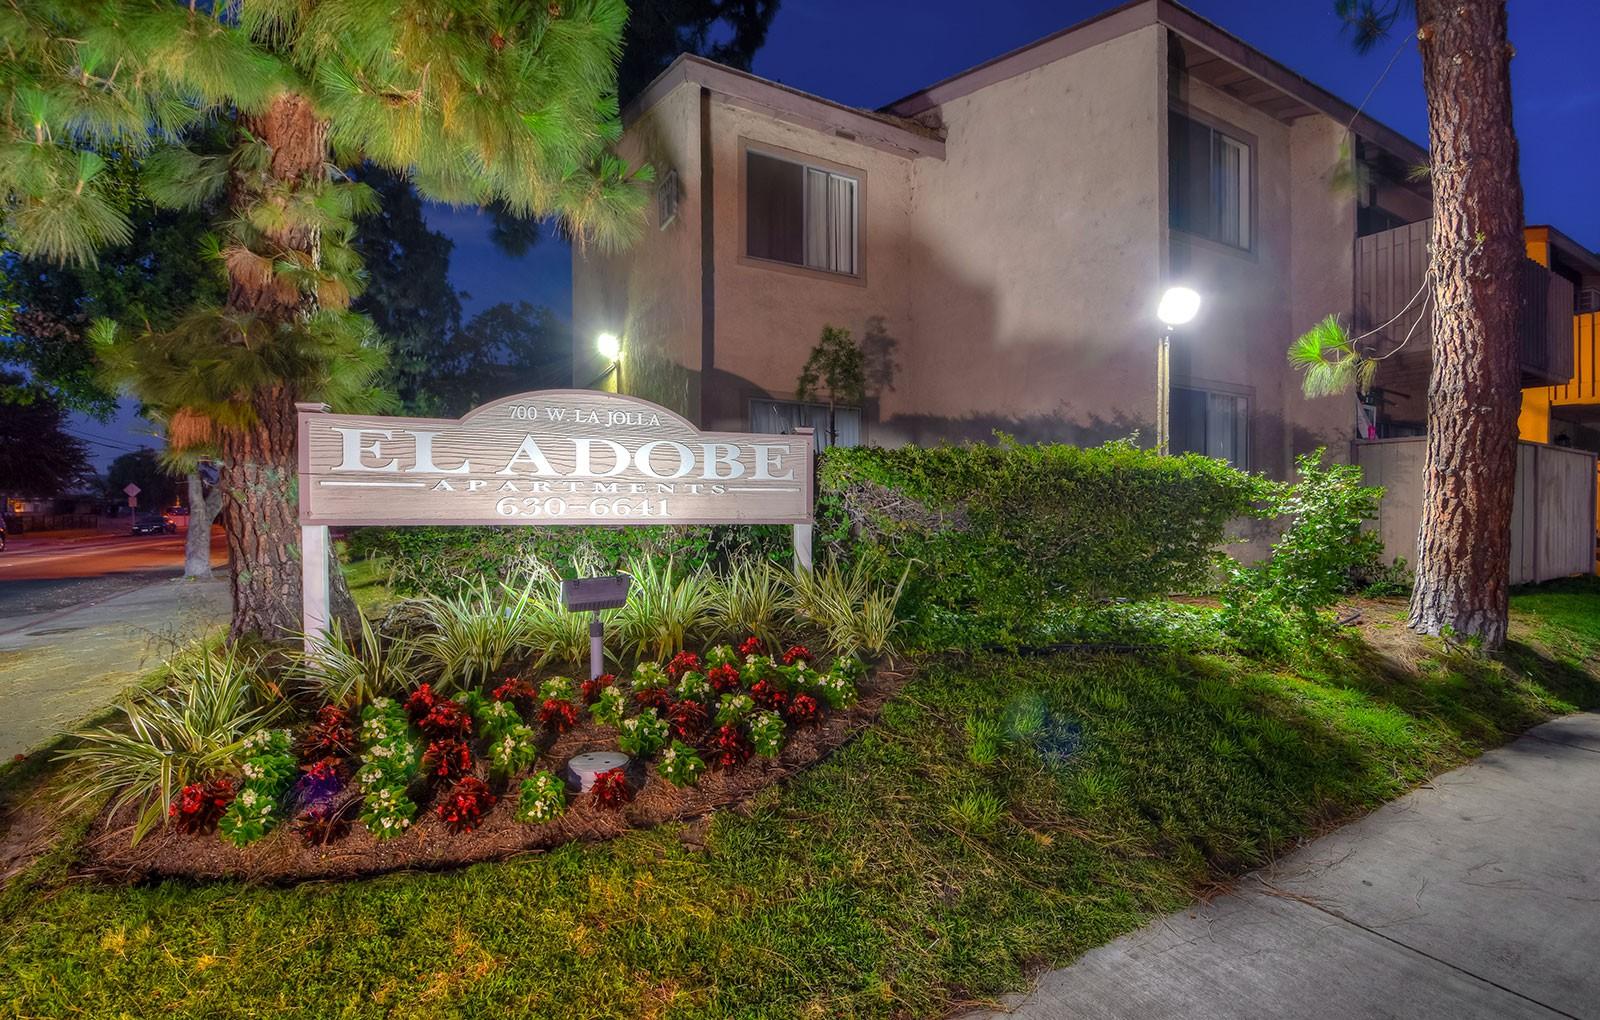 Apartments Near CSU Fullerton El Adobe for Cal State Fullerton Students in Fullerton, CA